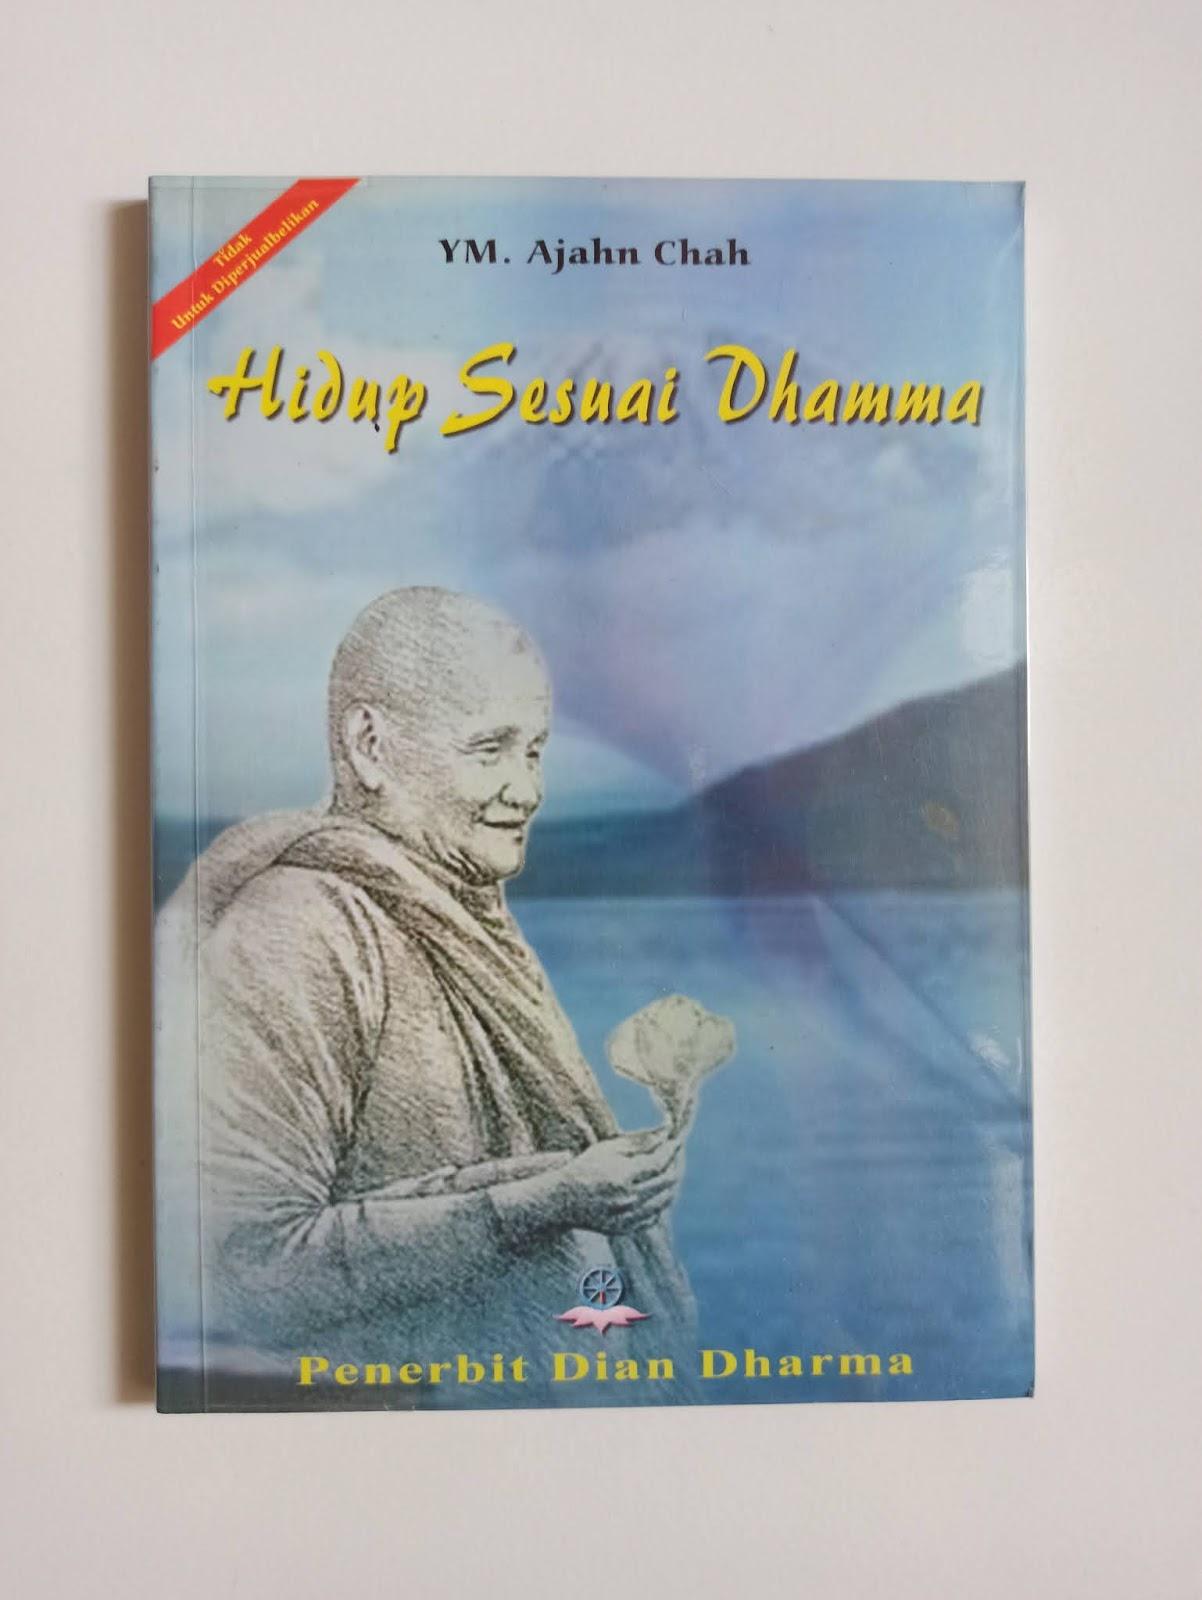 Buku karya Ajahn Chah